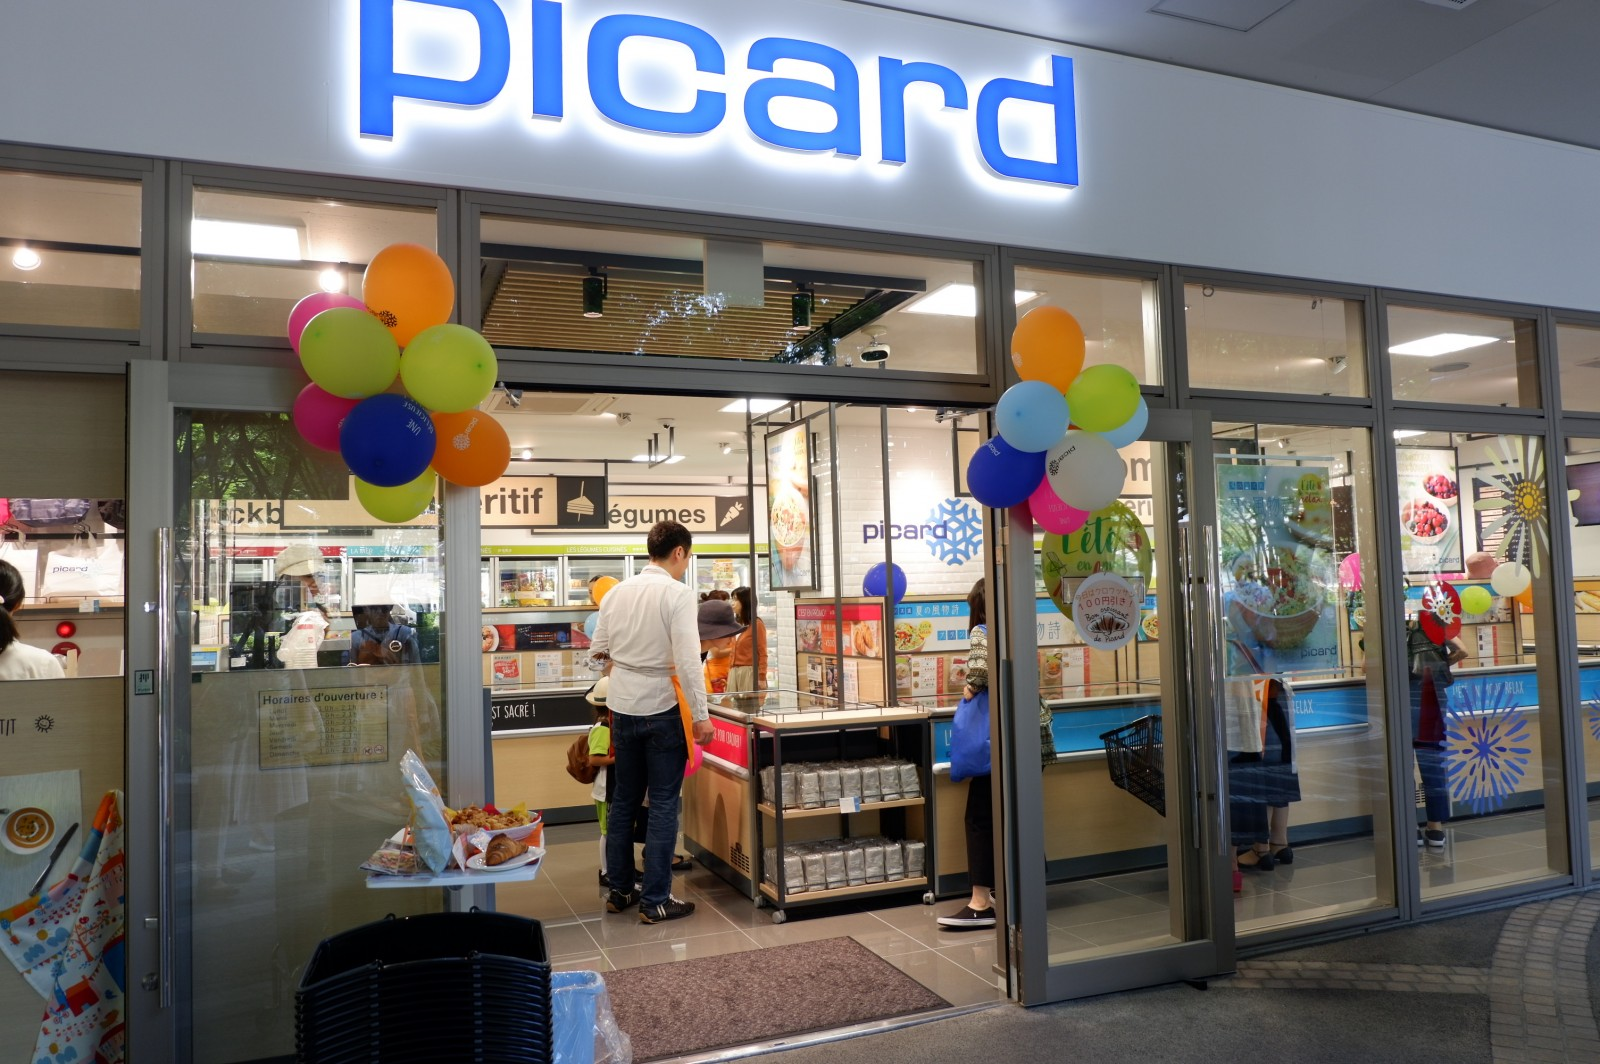 Picard(ピカール)武蔵小杉店オープン! 初日から賑わい フォアグラ、鴨肉も入荷